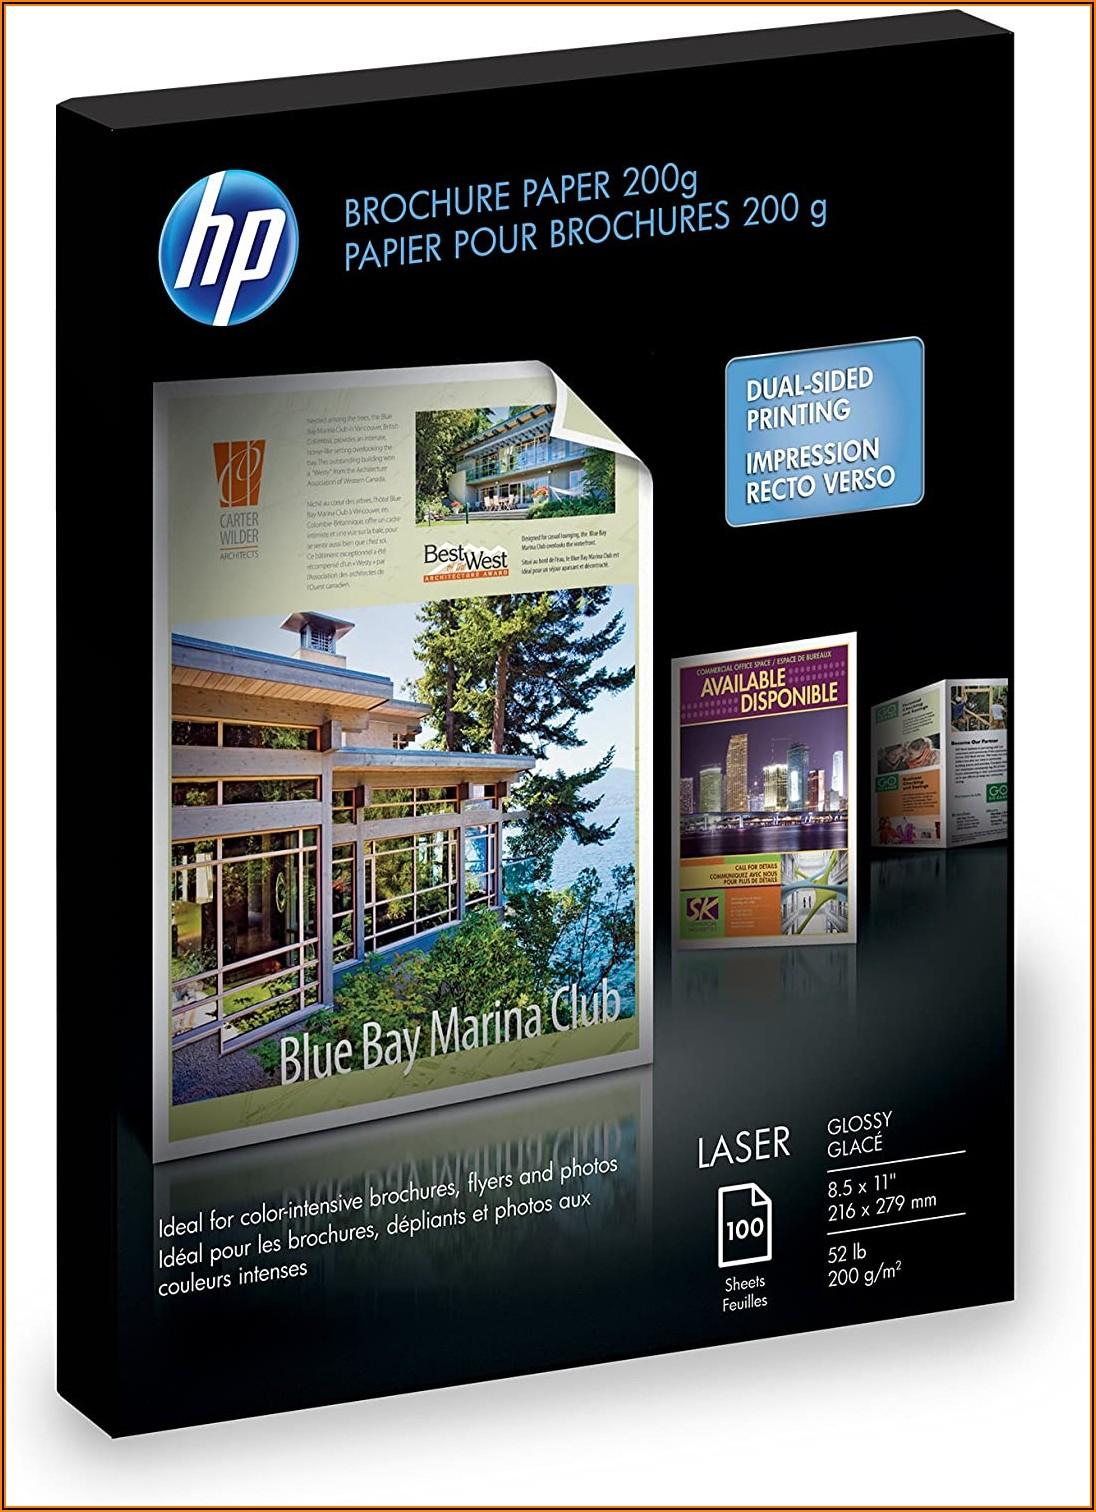 Hp Brochure Paper 200g